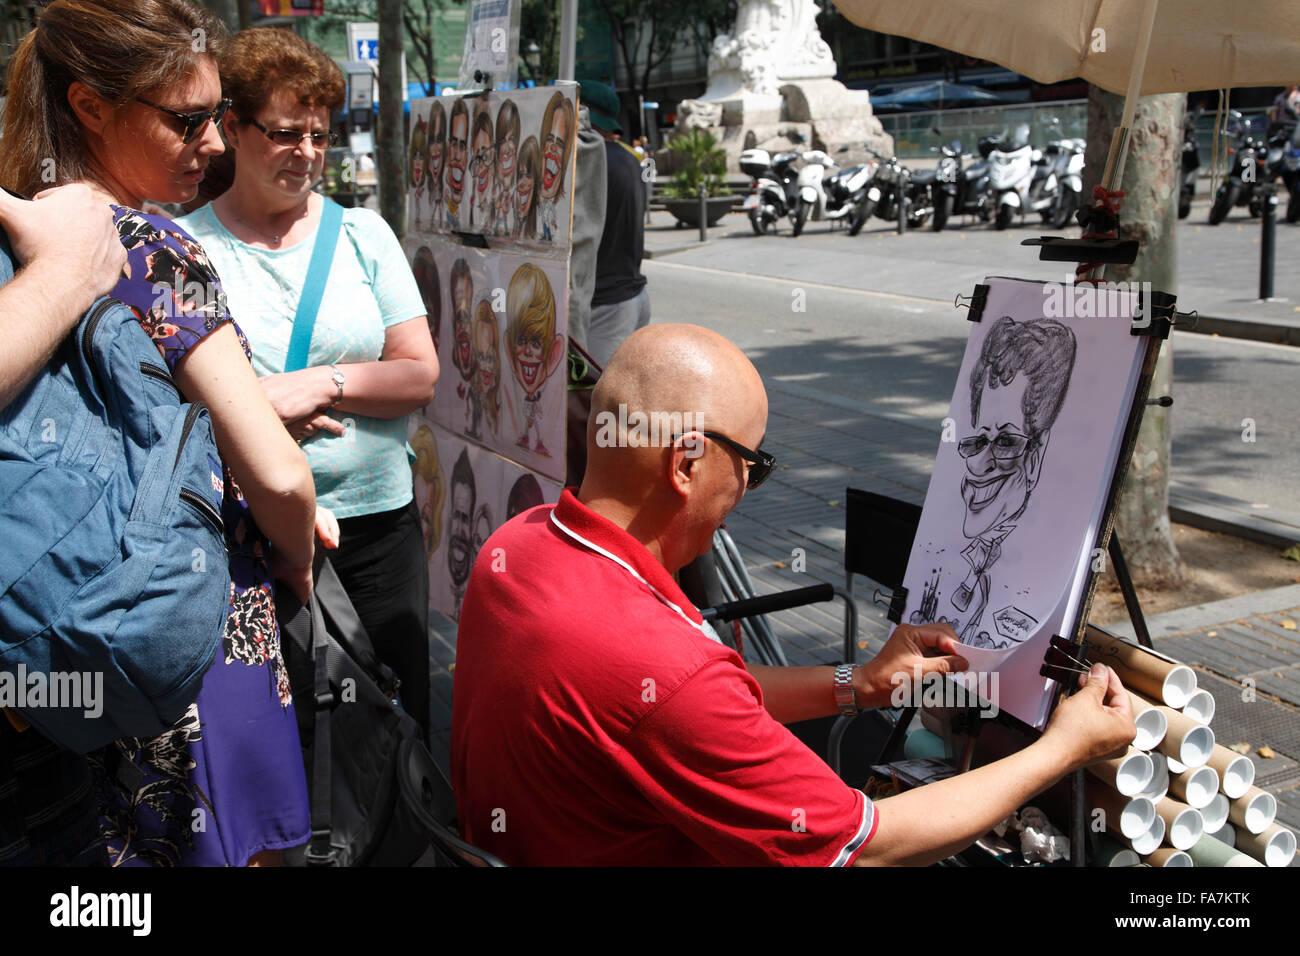 Maler bei der Rambla, Barri Gotic, Barcelona, Spanien, Europa Stockbild